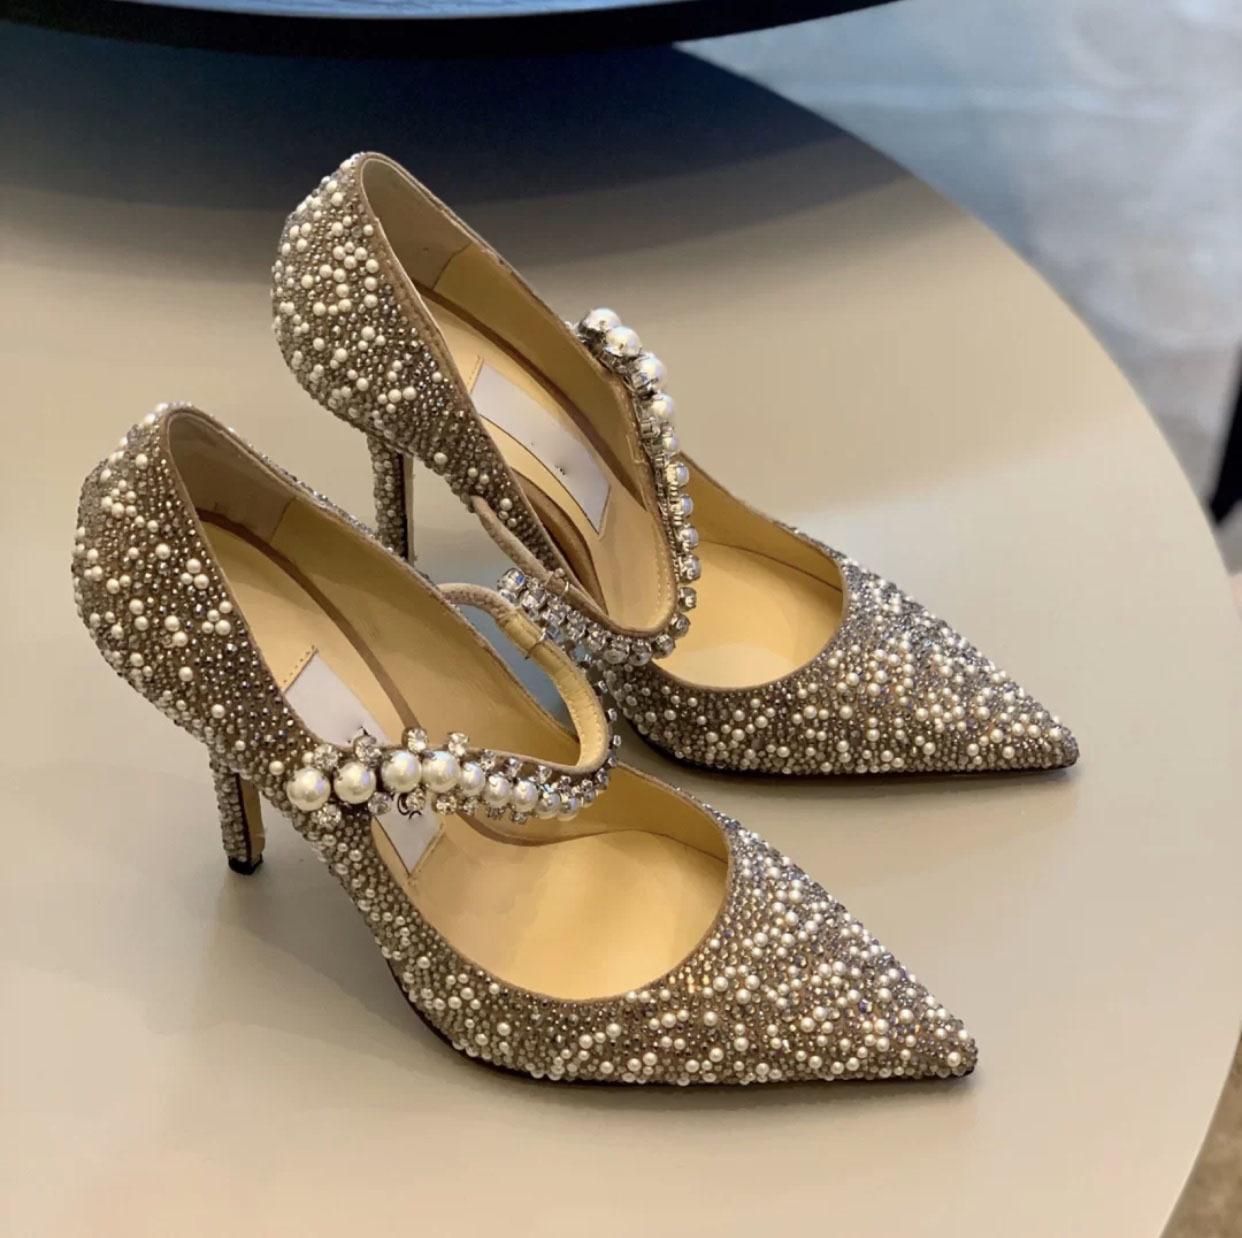 jc rhinestone pearl high heels female stiletto crystal princess wedding shoes bridal shoes pointed w